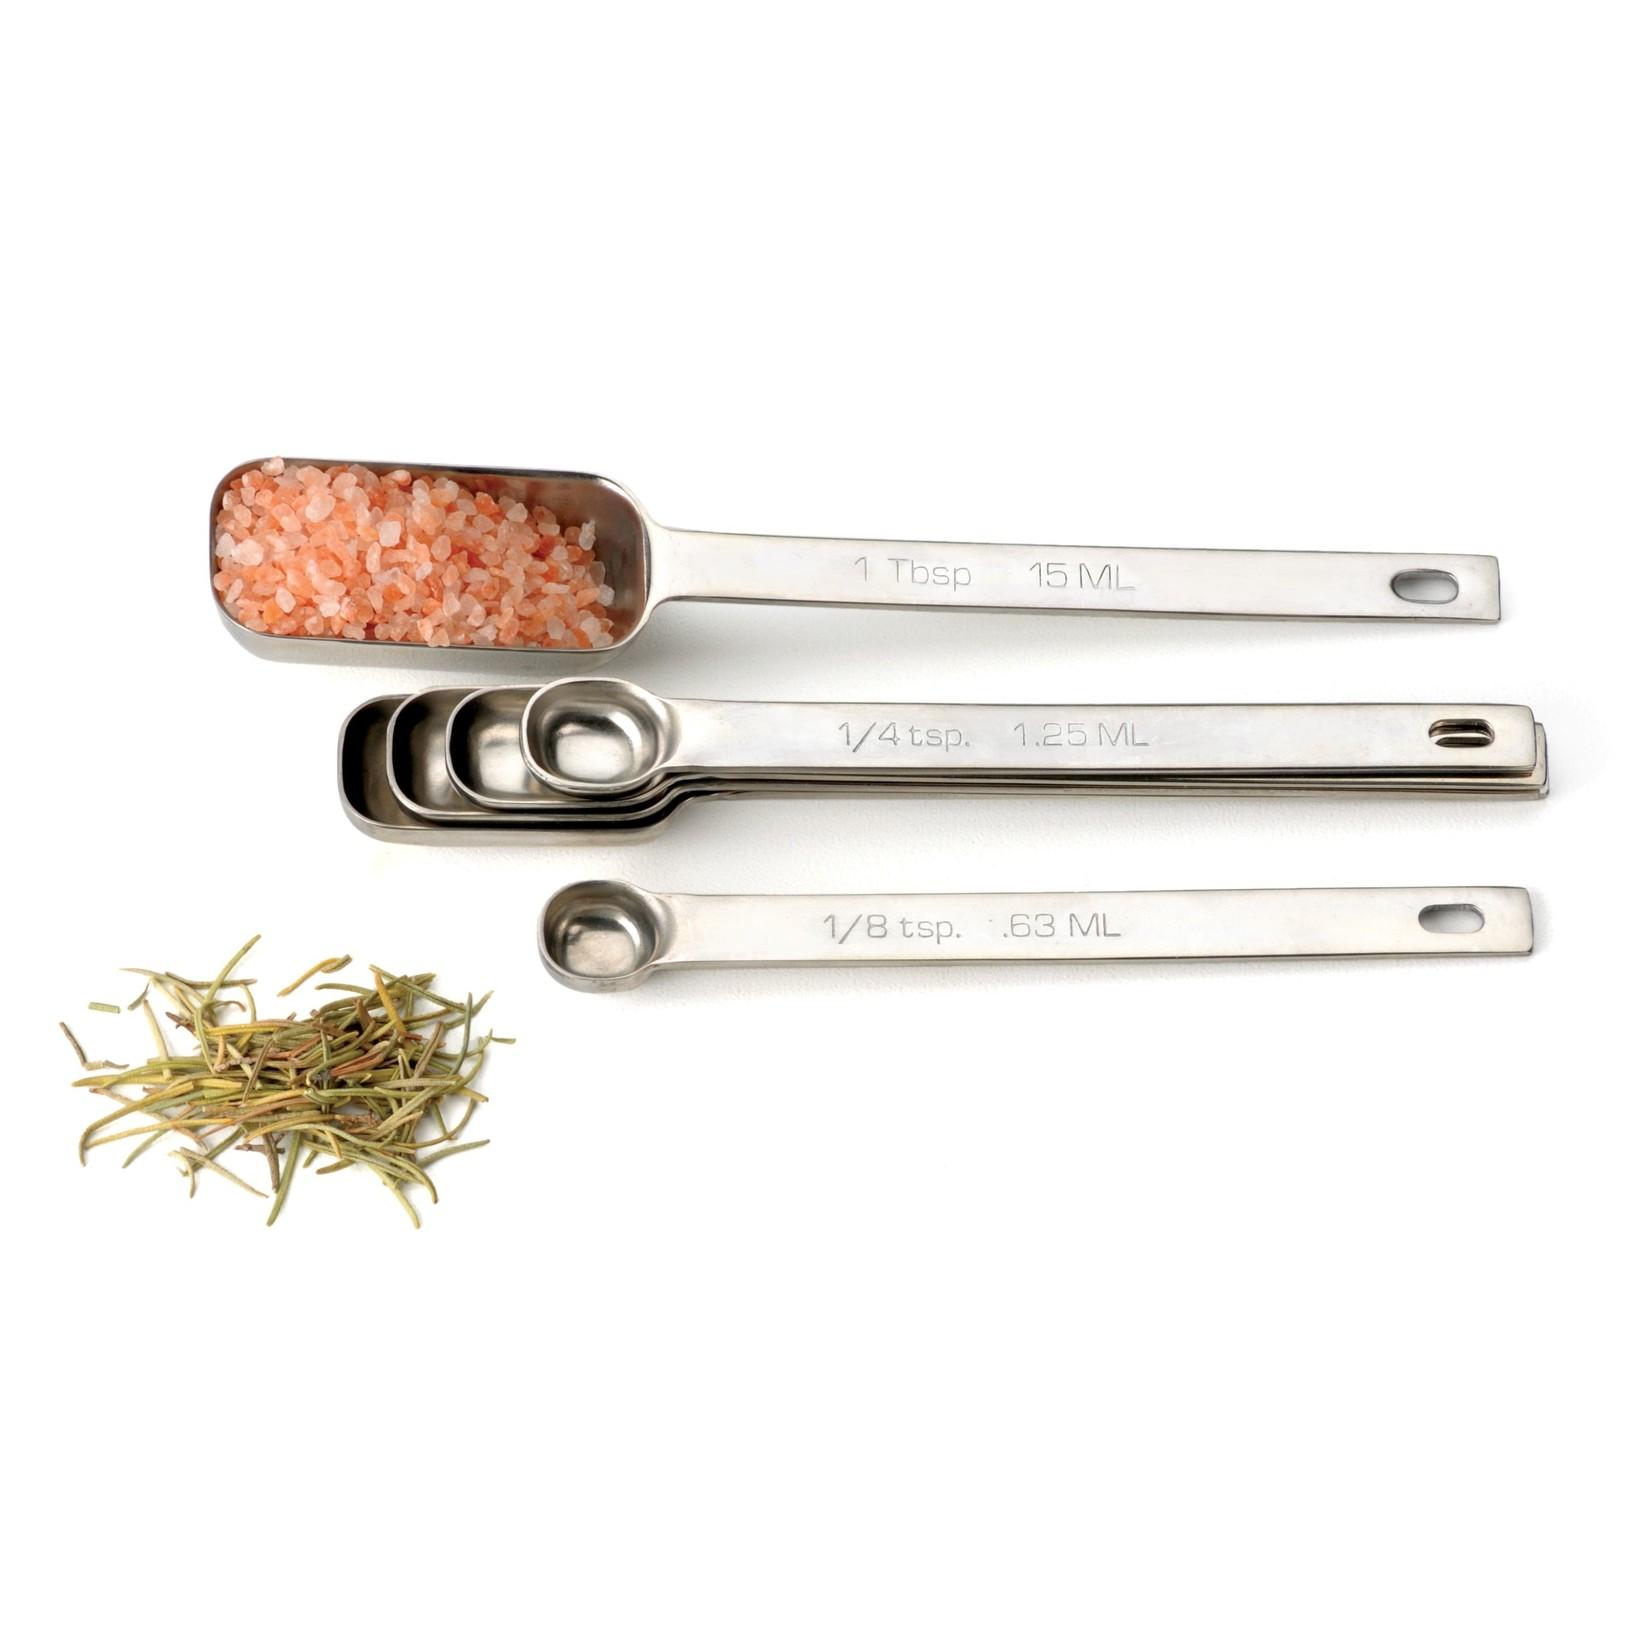 RSVP International Endurance Spice Spoon Set